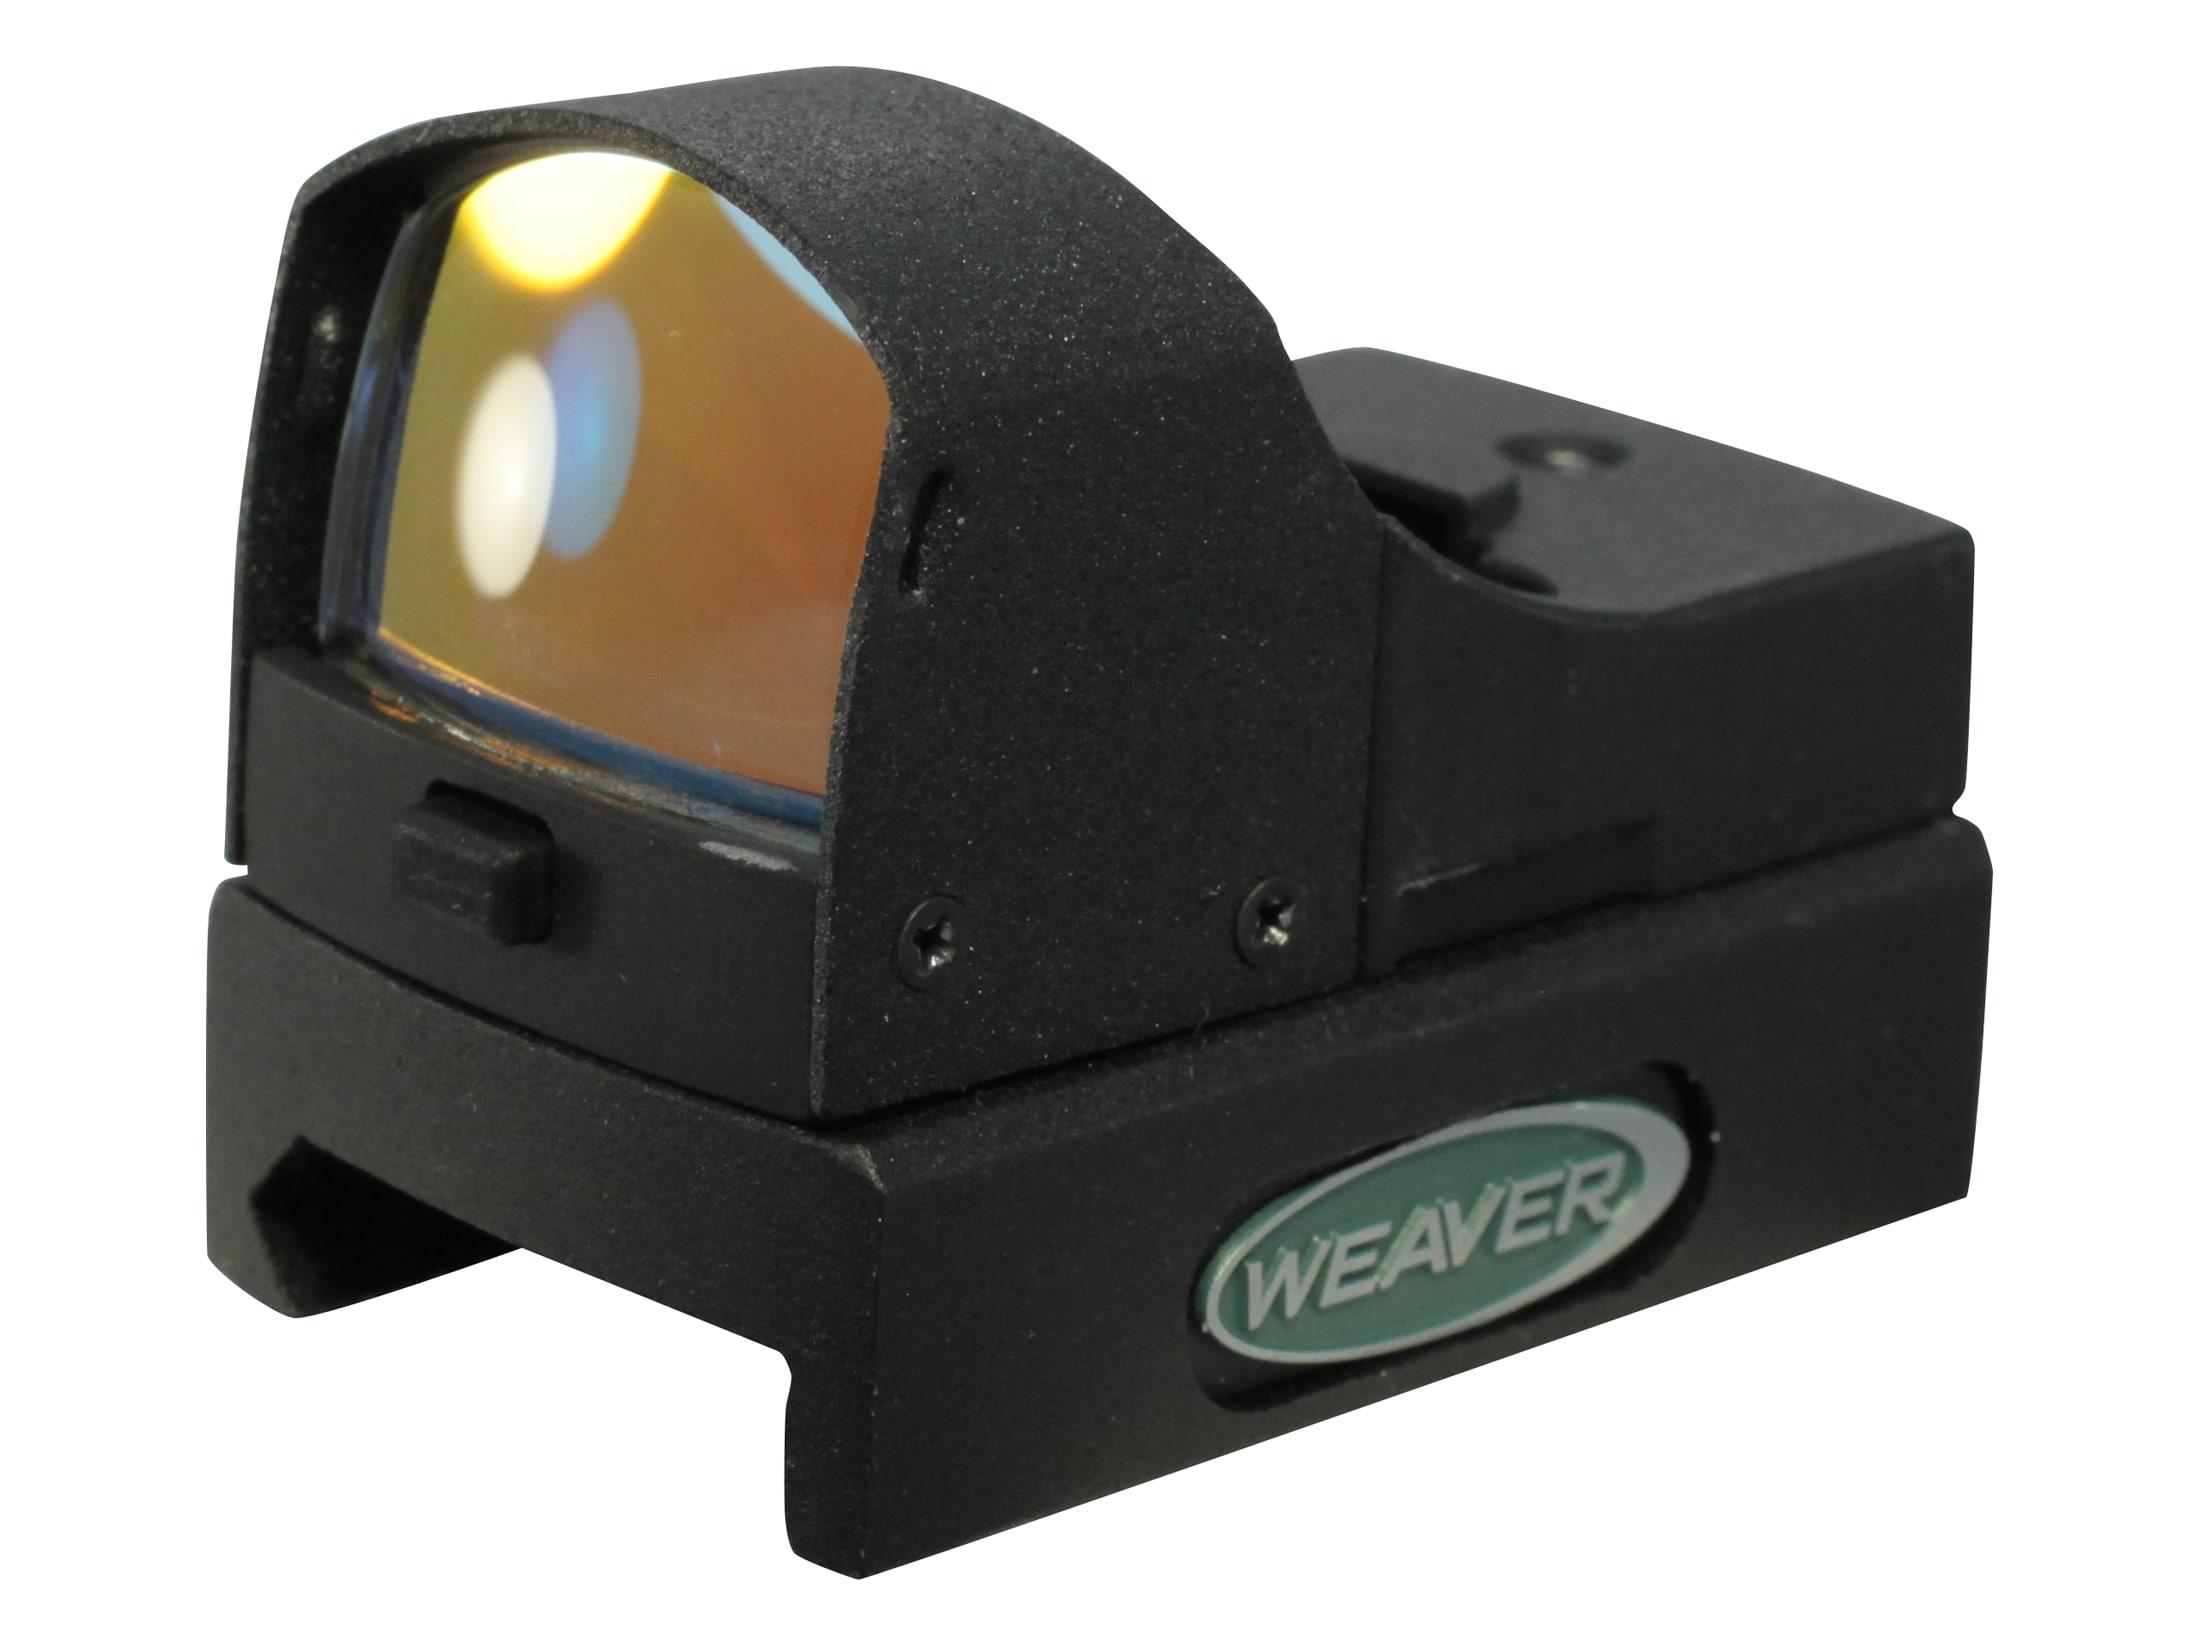 Weaver Micro Dot Reflex Red Dot Sight 4 MOA Dot Weaver-Style Mount